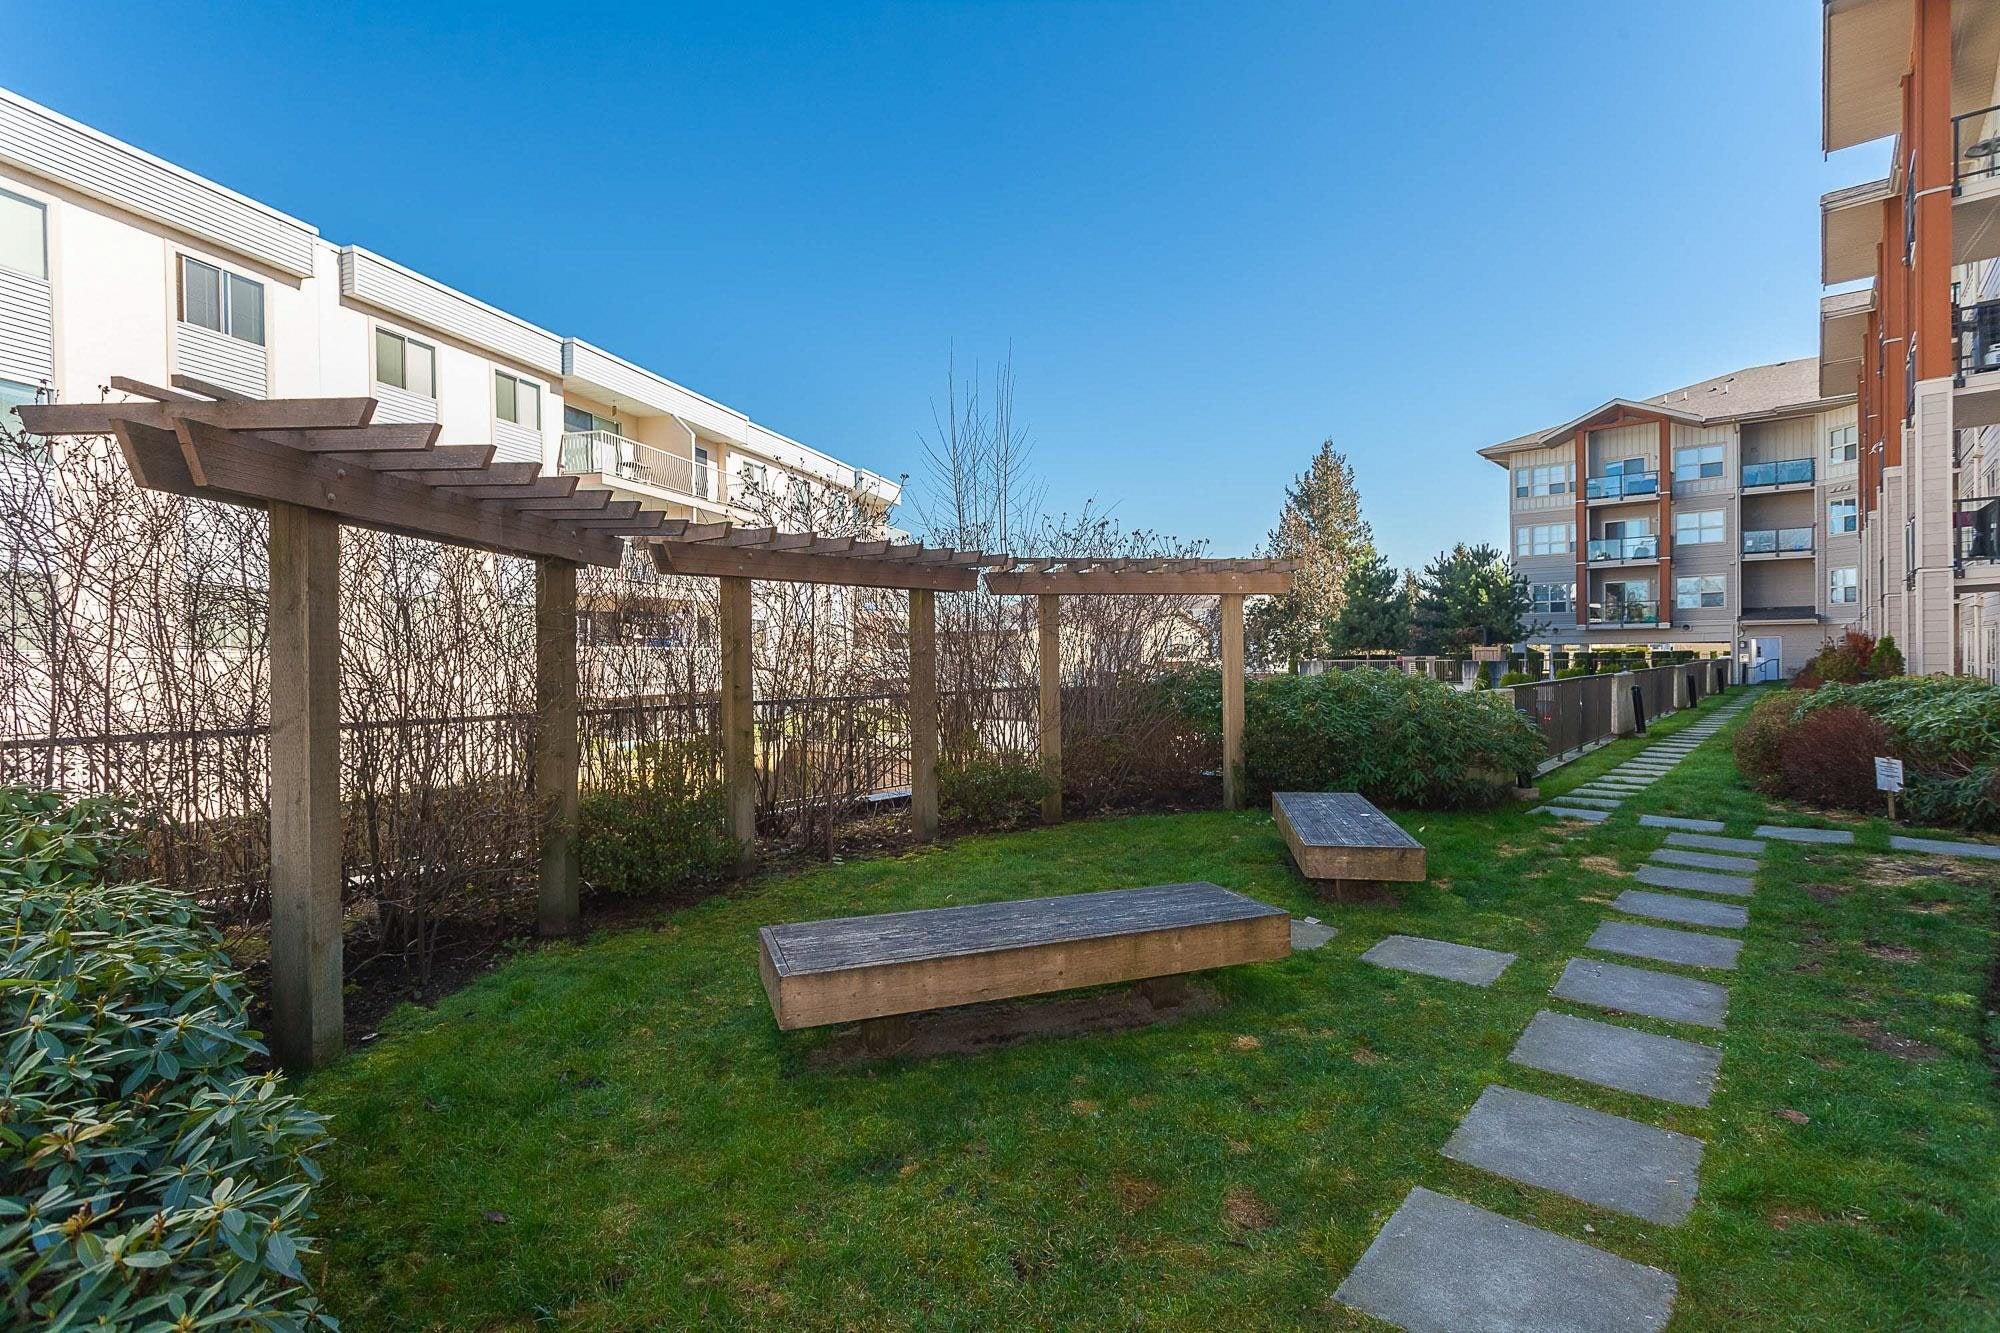 114 20219 54A AVENUE - Langley City Apartment/Condo for sale, 1 Bedroom (R2616172) - #25